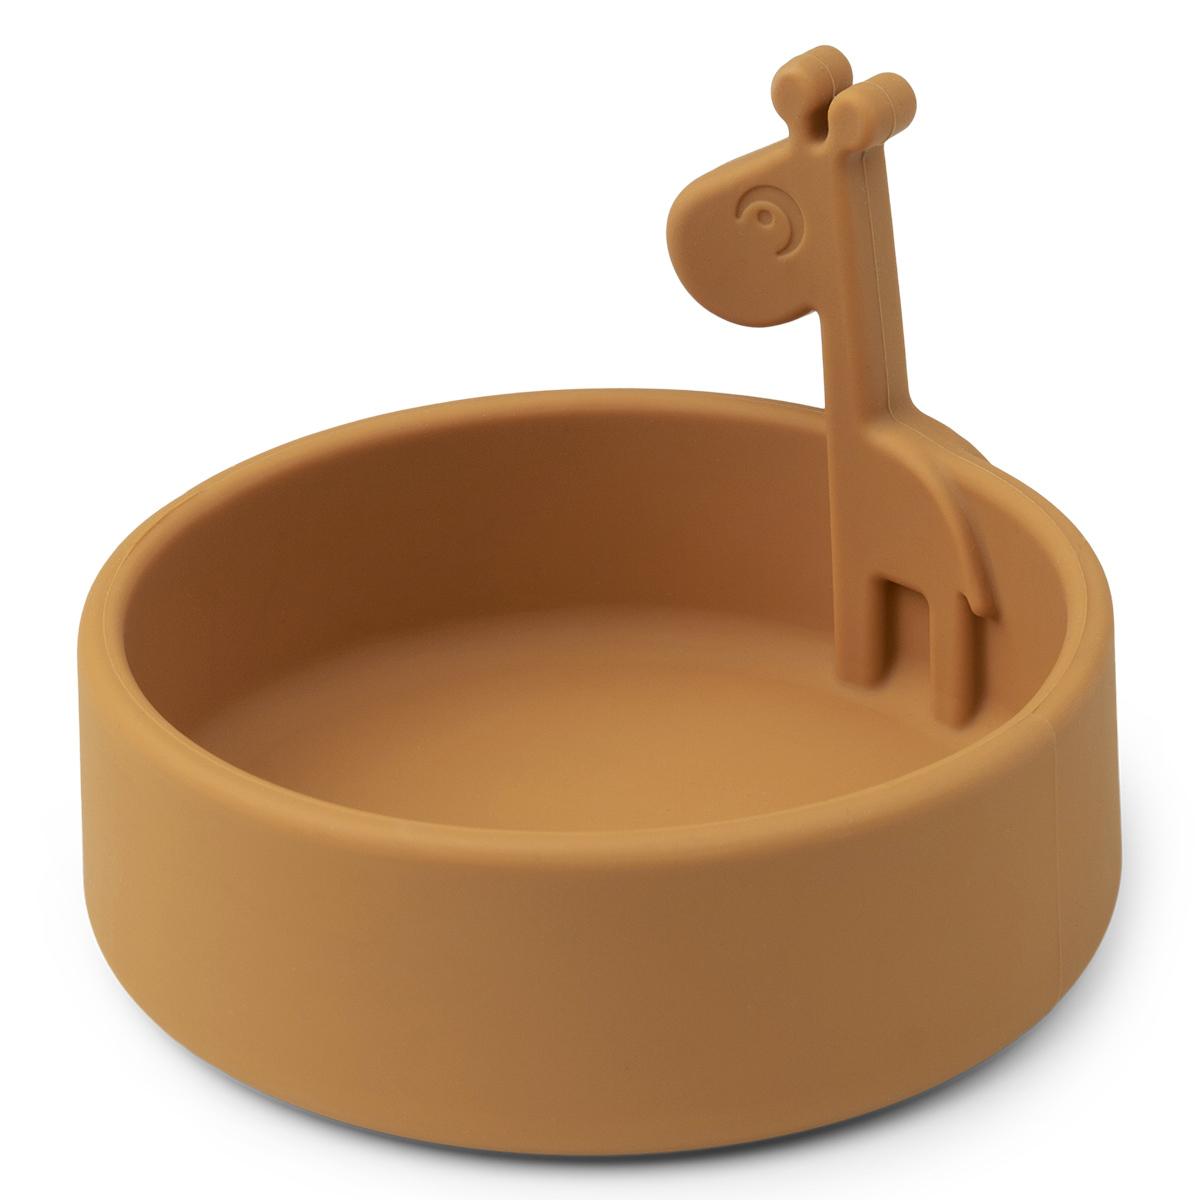 Vaisselle & Couvert Bol Peekaboo Raffi - Moutarde Bol Peekaboo Raffi - Moutarde